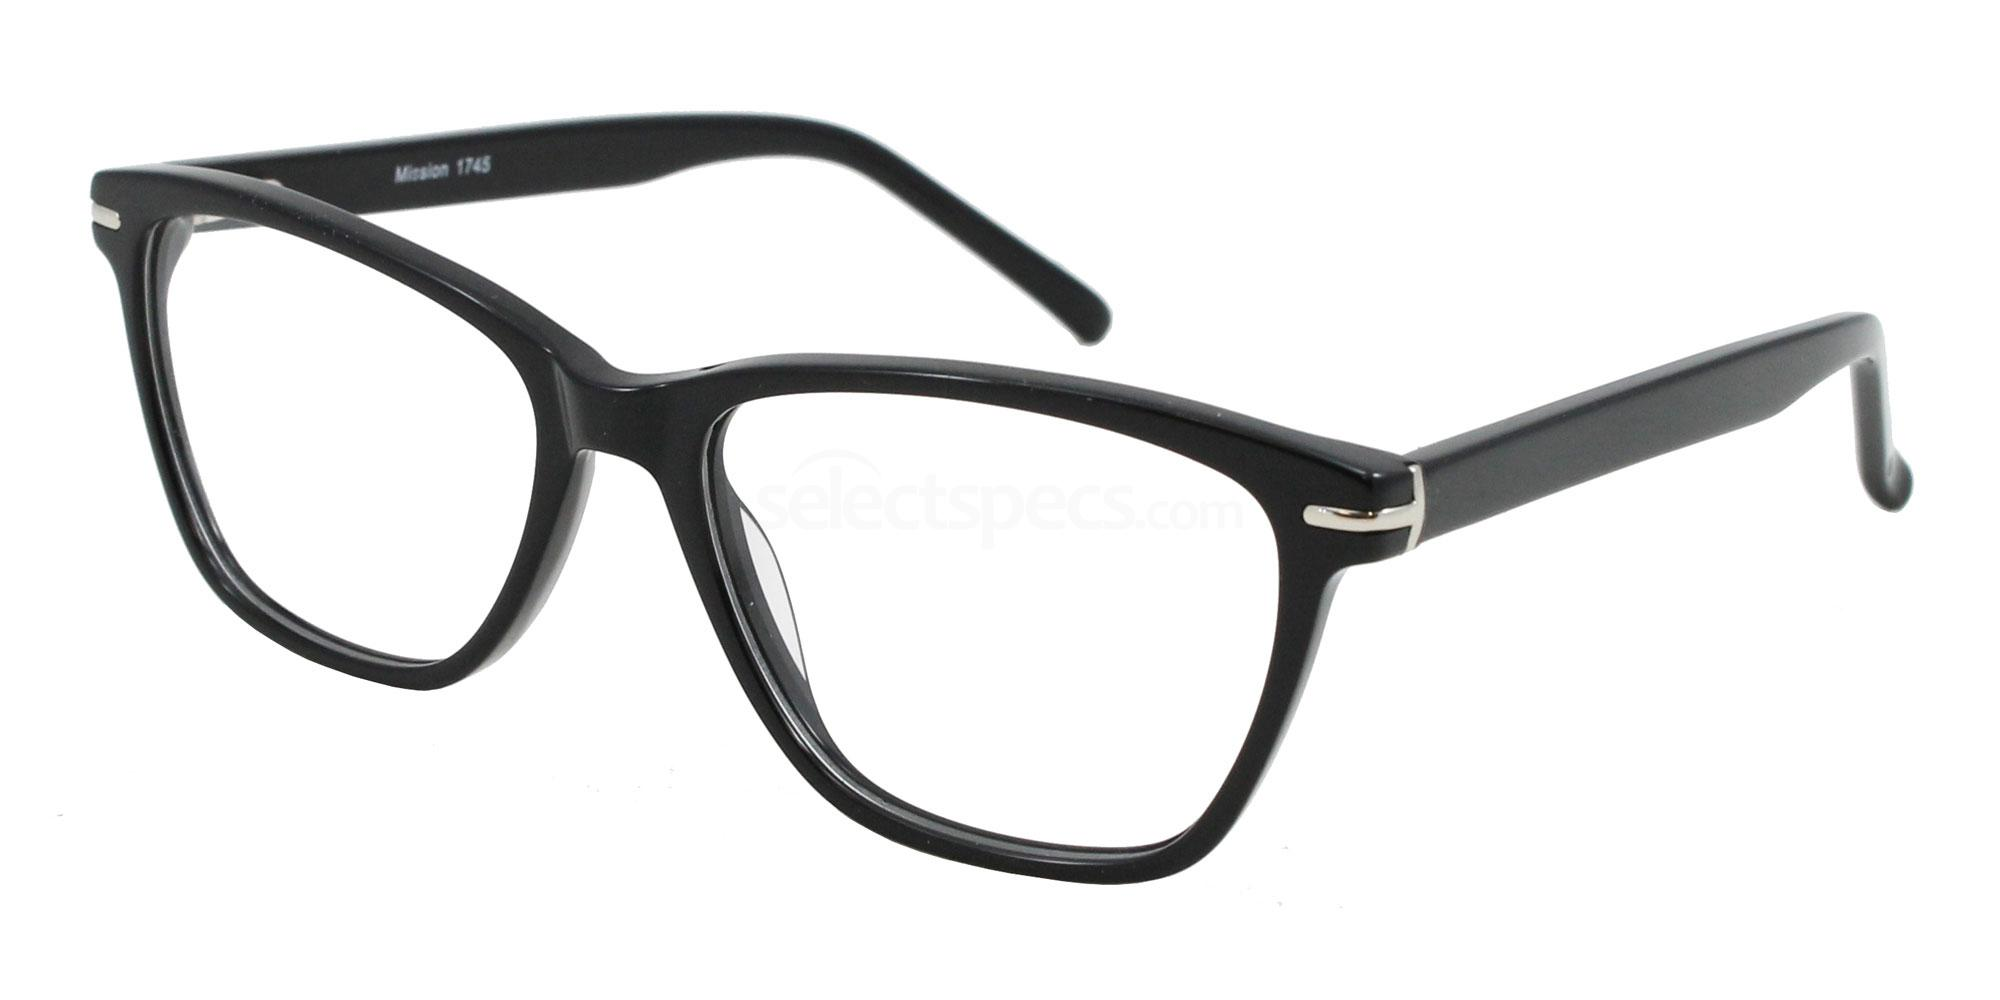 03 1745 Glasses, Mission